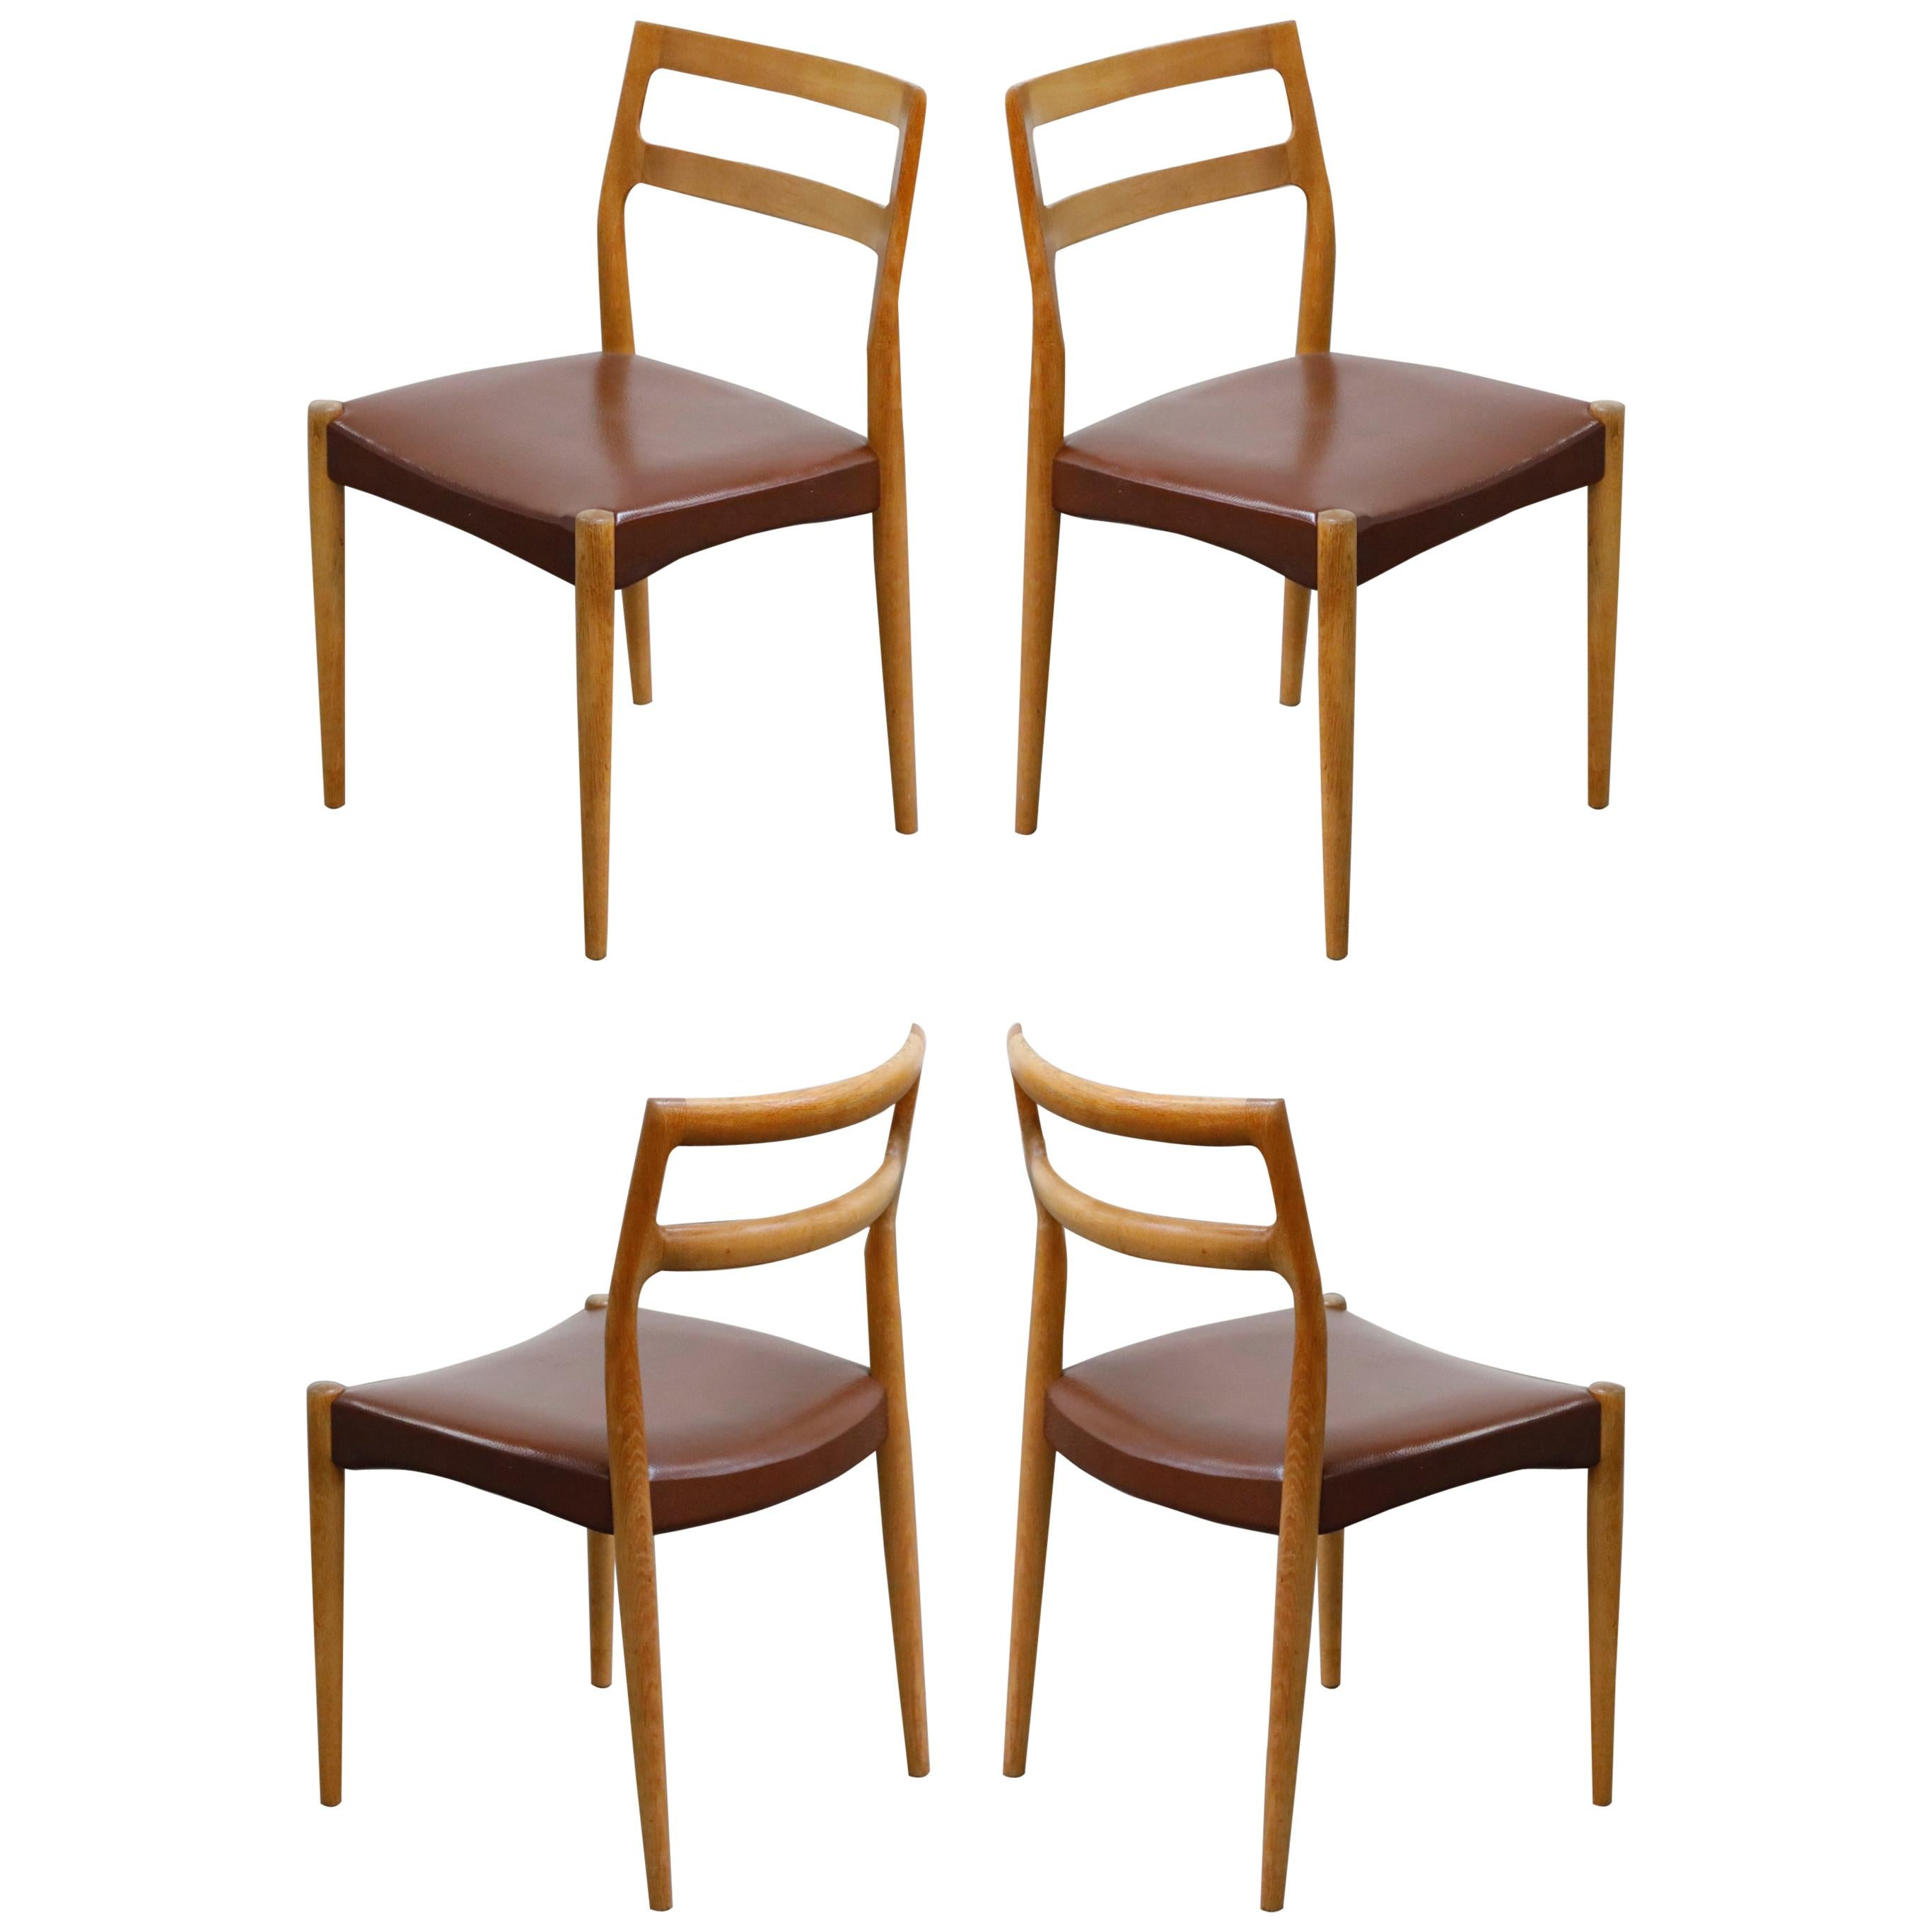 Set of Four Johannes Andersen for Uldum Møbelfabrik Danish Modern Dining Chairs